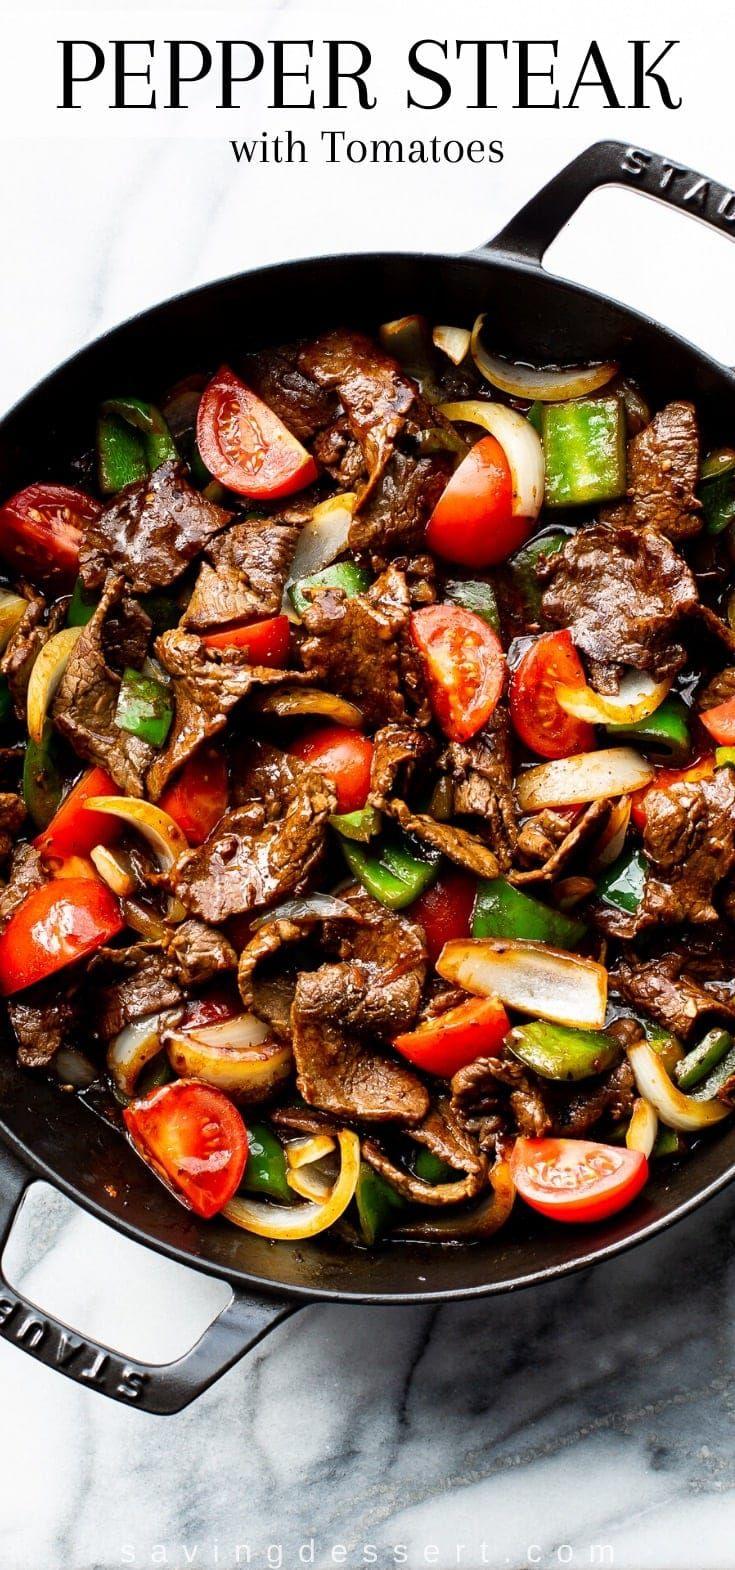 Green Pepper Steak Recipe In 2020 Pepper Steak Stuffed Peppers Beef Dinner